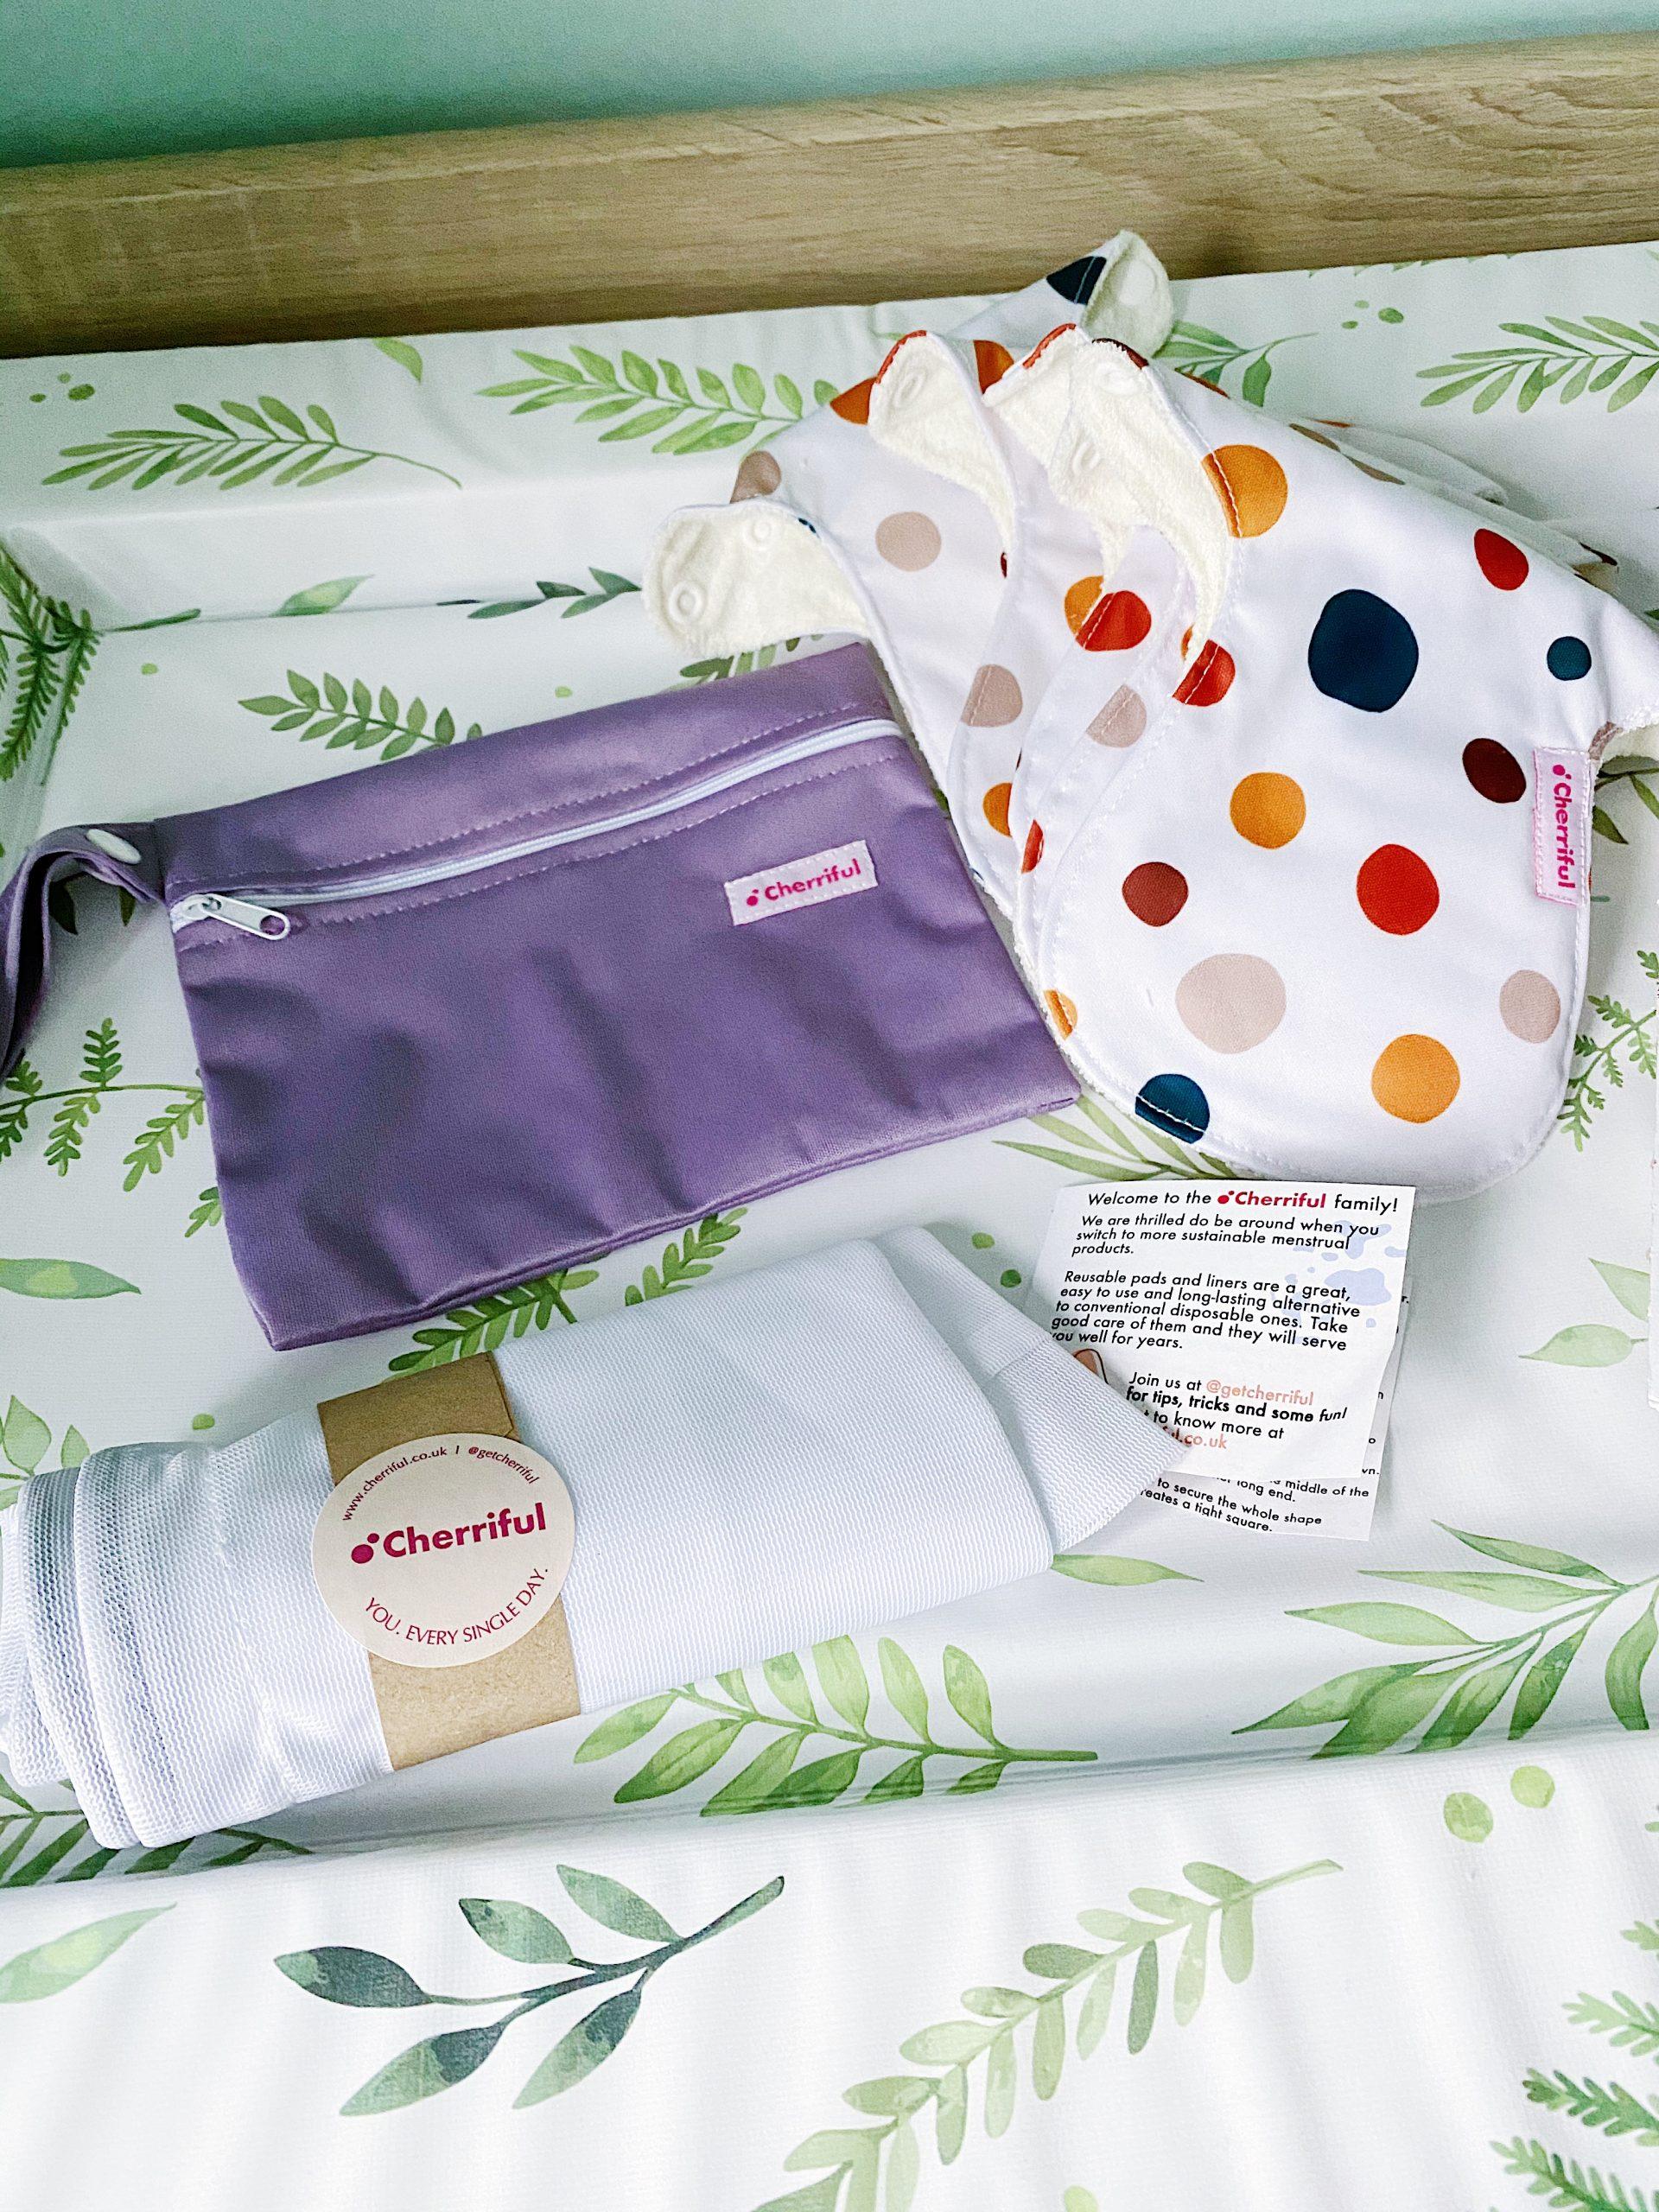 Cherriful Reusable Maternity & Period Pads